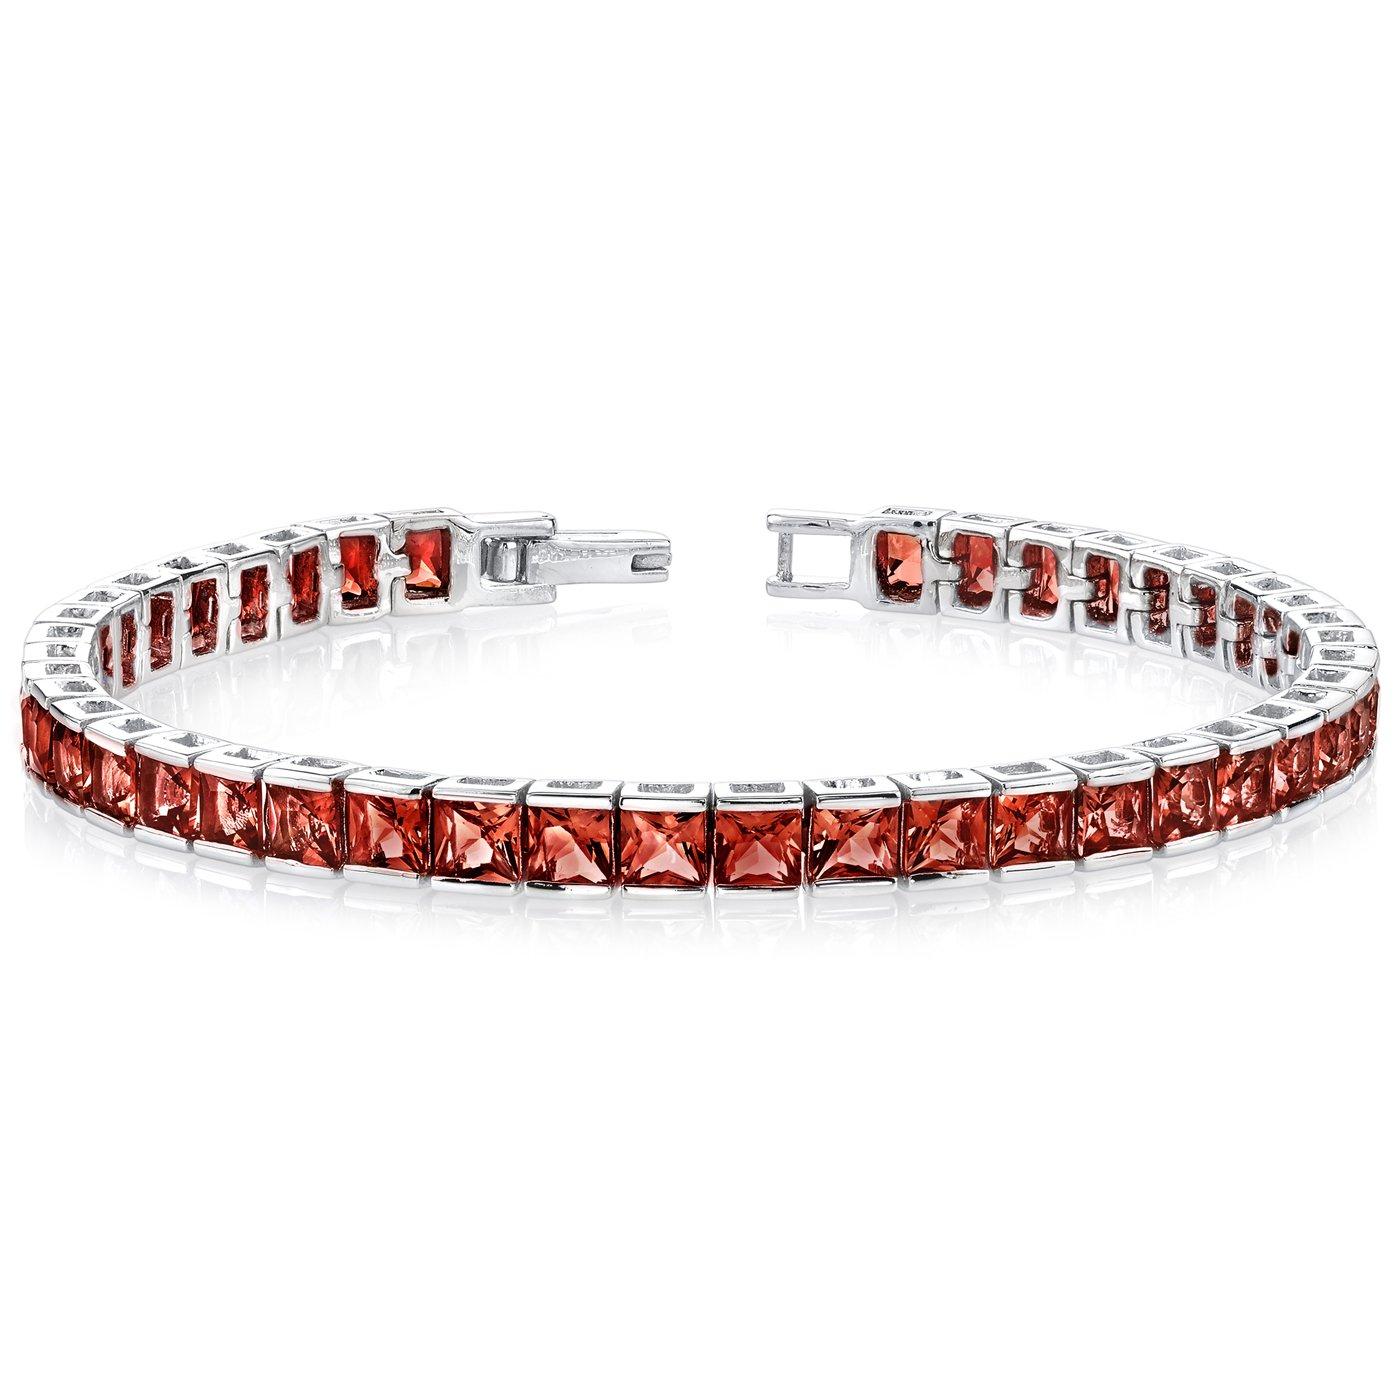 Garnet Tennis Bracelet Sterling Silver Princess Cut 16.75 Carats